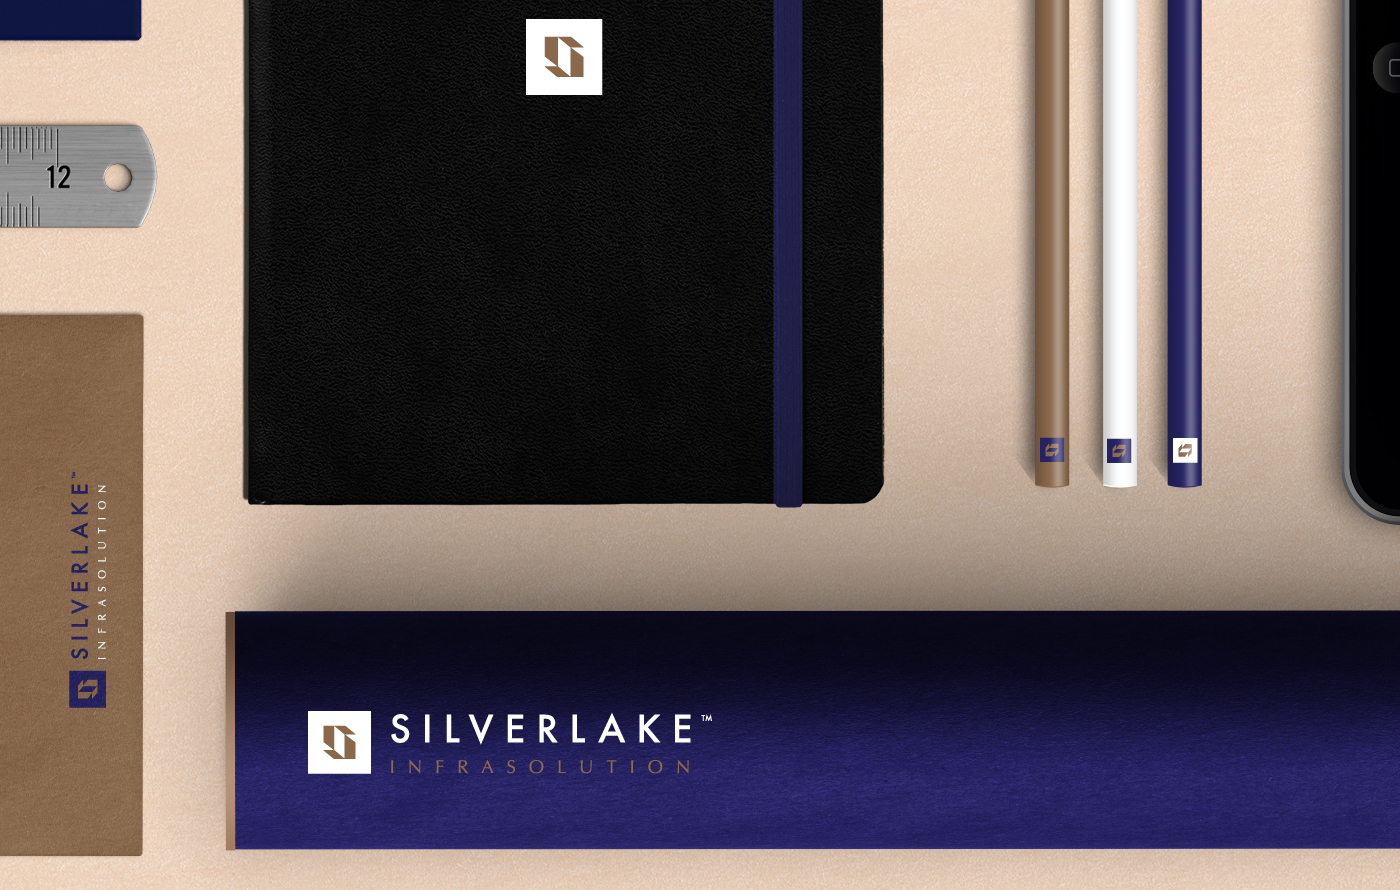 logo silverlake brand building construction architecture